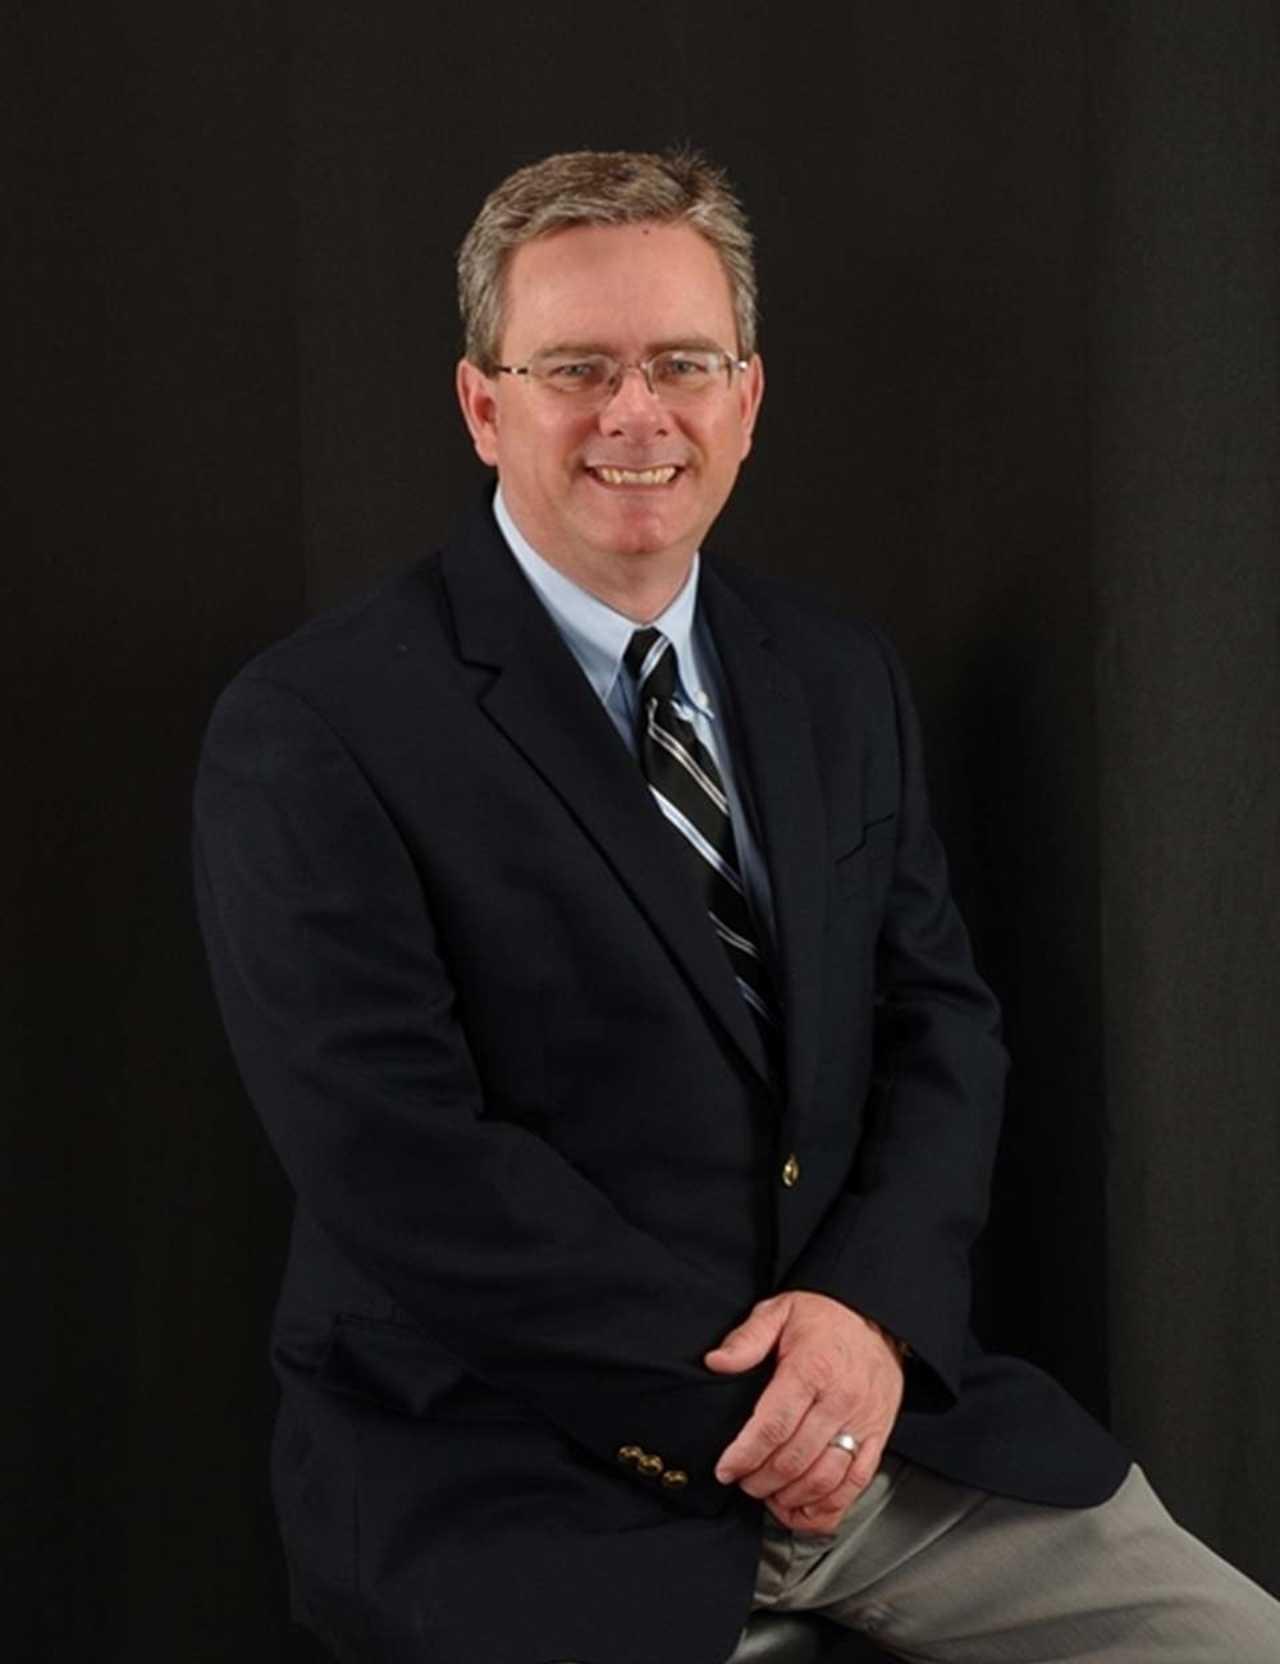 Darrin Wade - State Farm Insurance Agent - Insurance - Insurance Brokers in Attalla AL